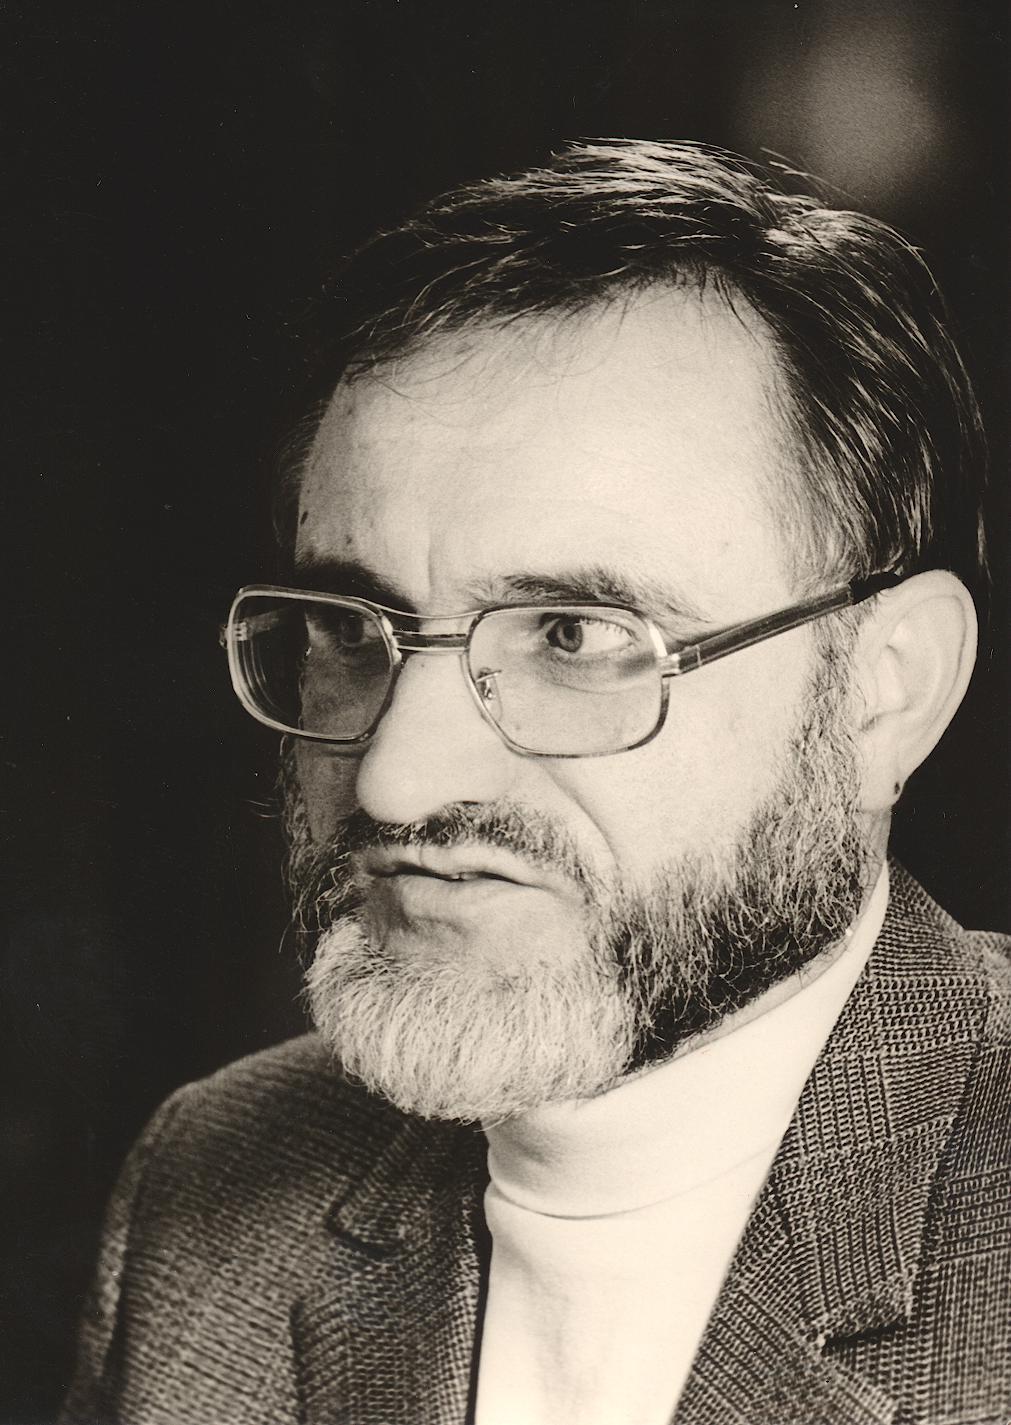 X. Imago Mundi-Kongress 1985, Innsbruck, Dr. Walter A. Frank